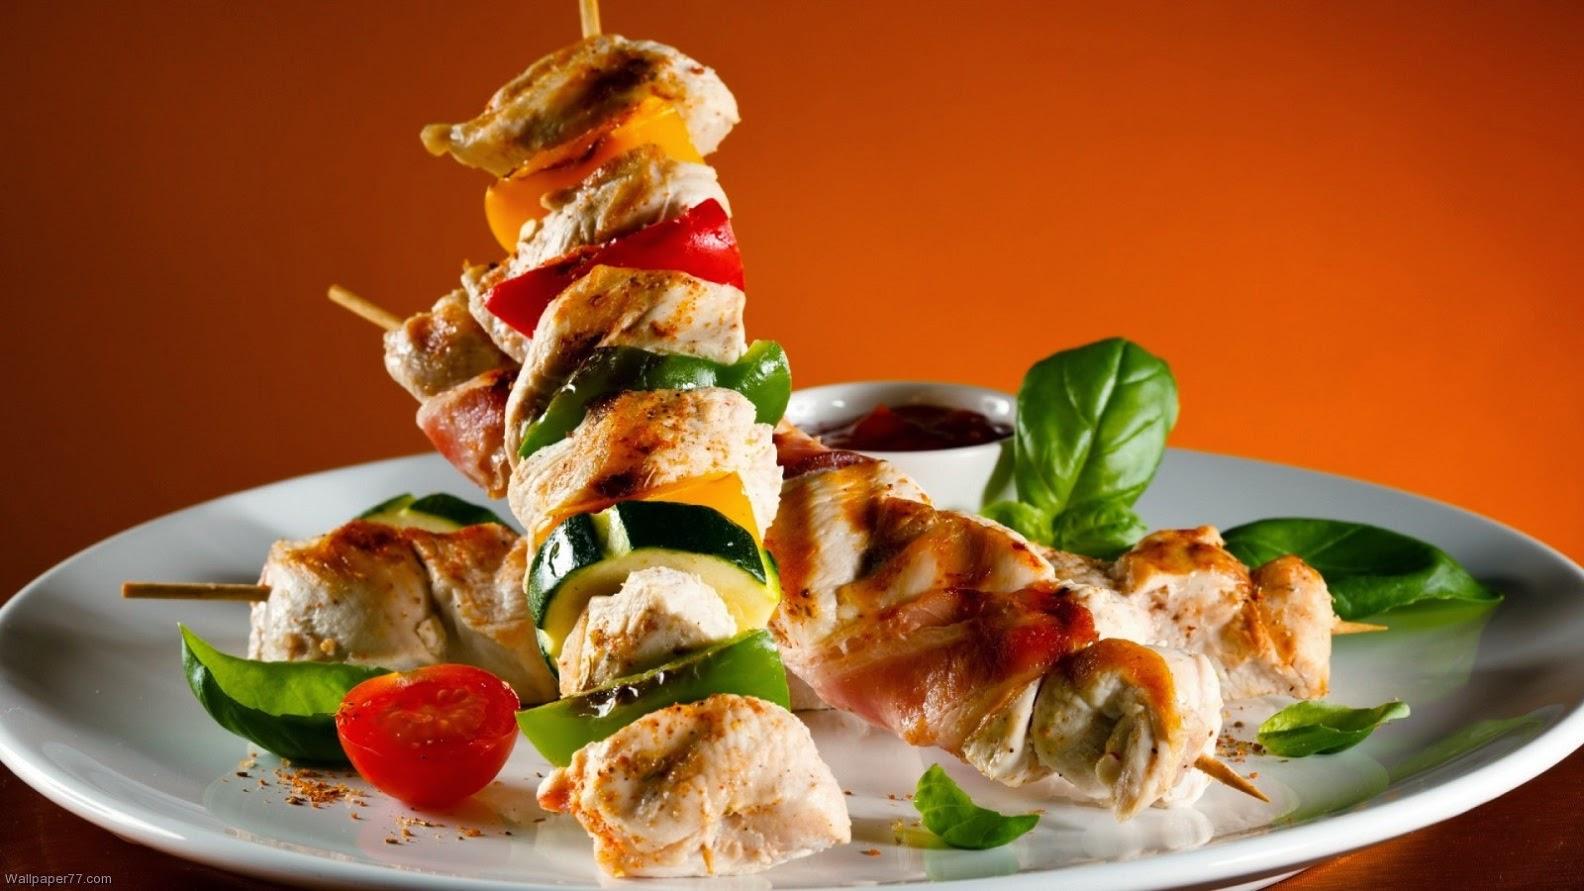 Best Quality Fast Food Chicken